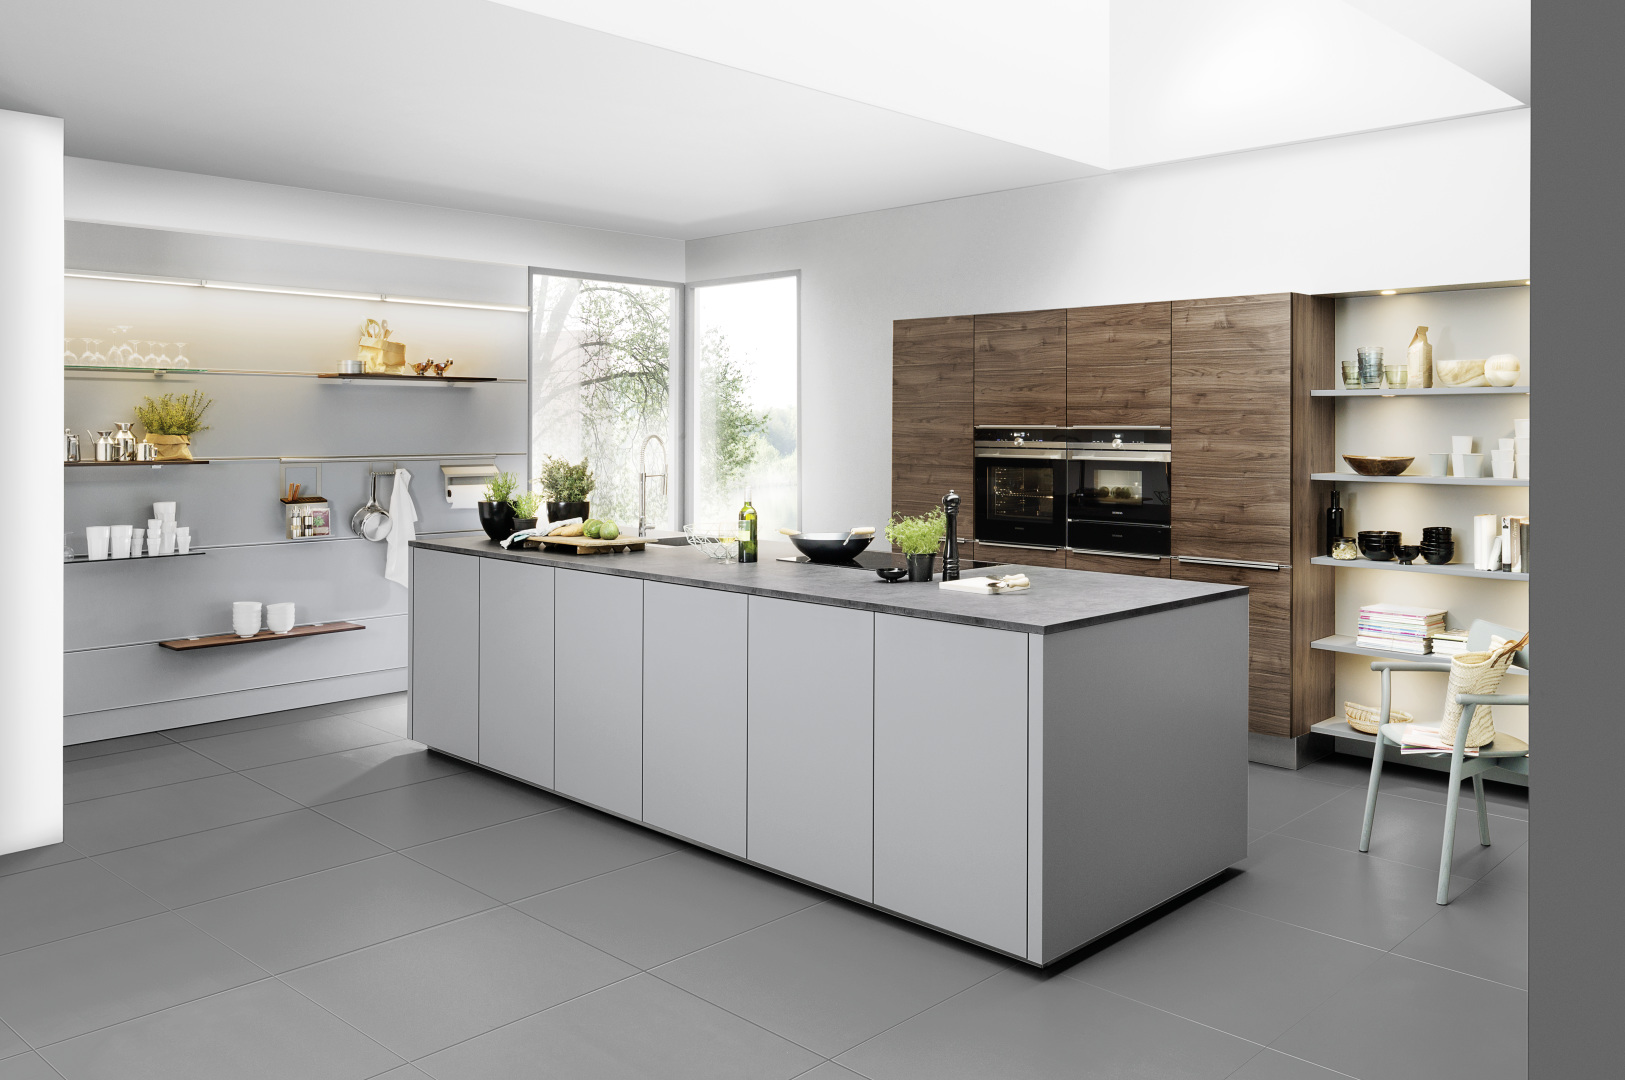 univers cuisine cuisines dagier. Black Bedroom Furniture Sets. Home Design Ideas